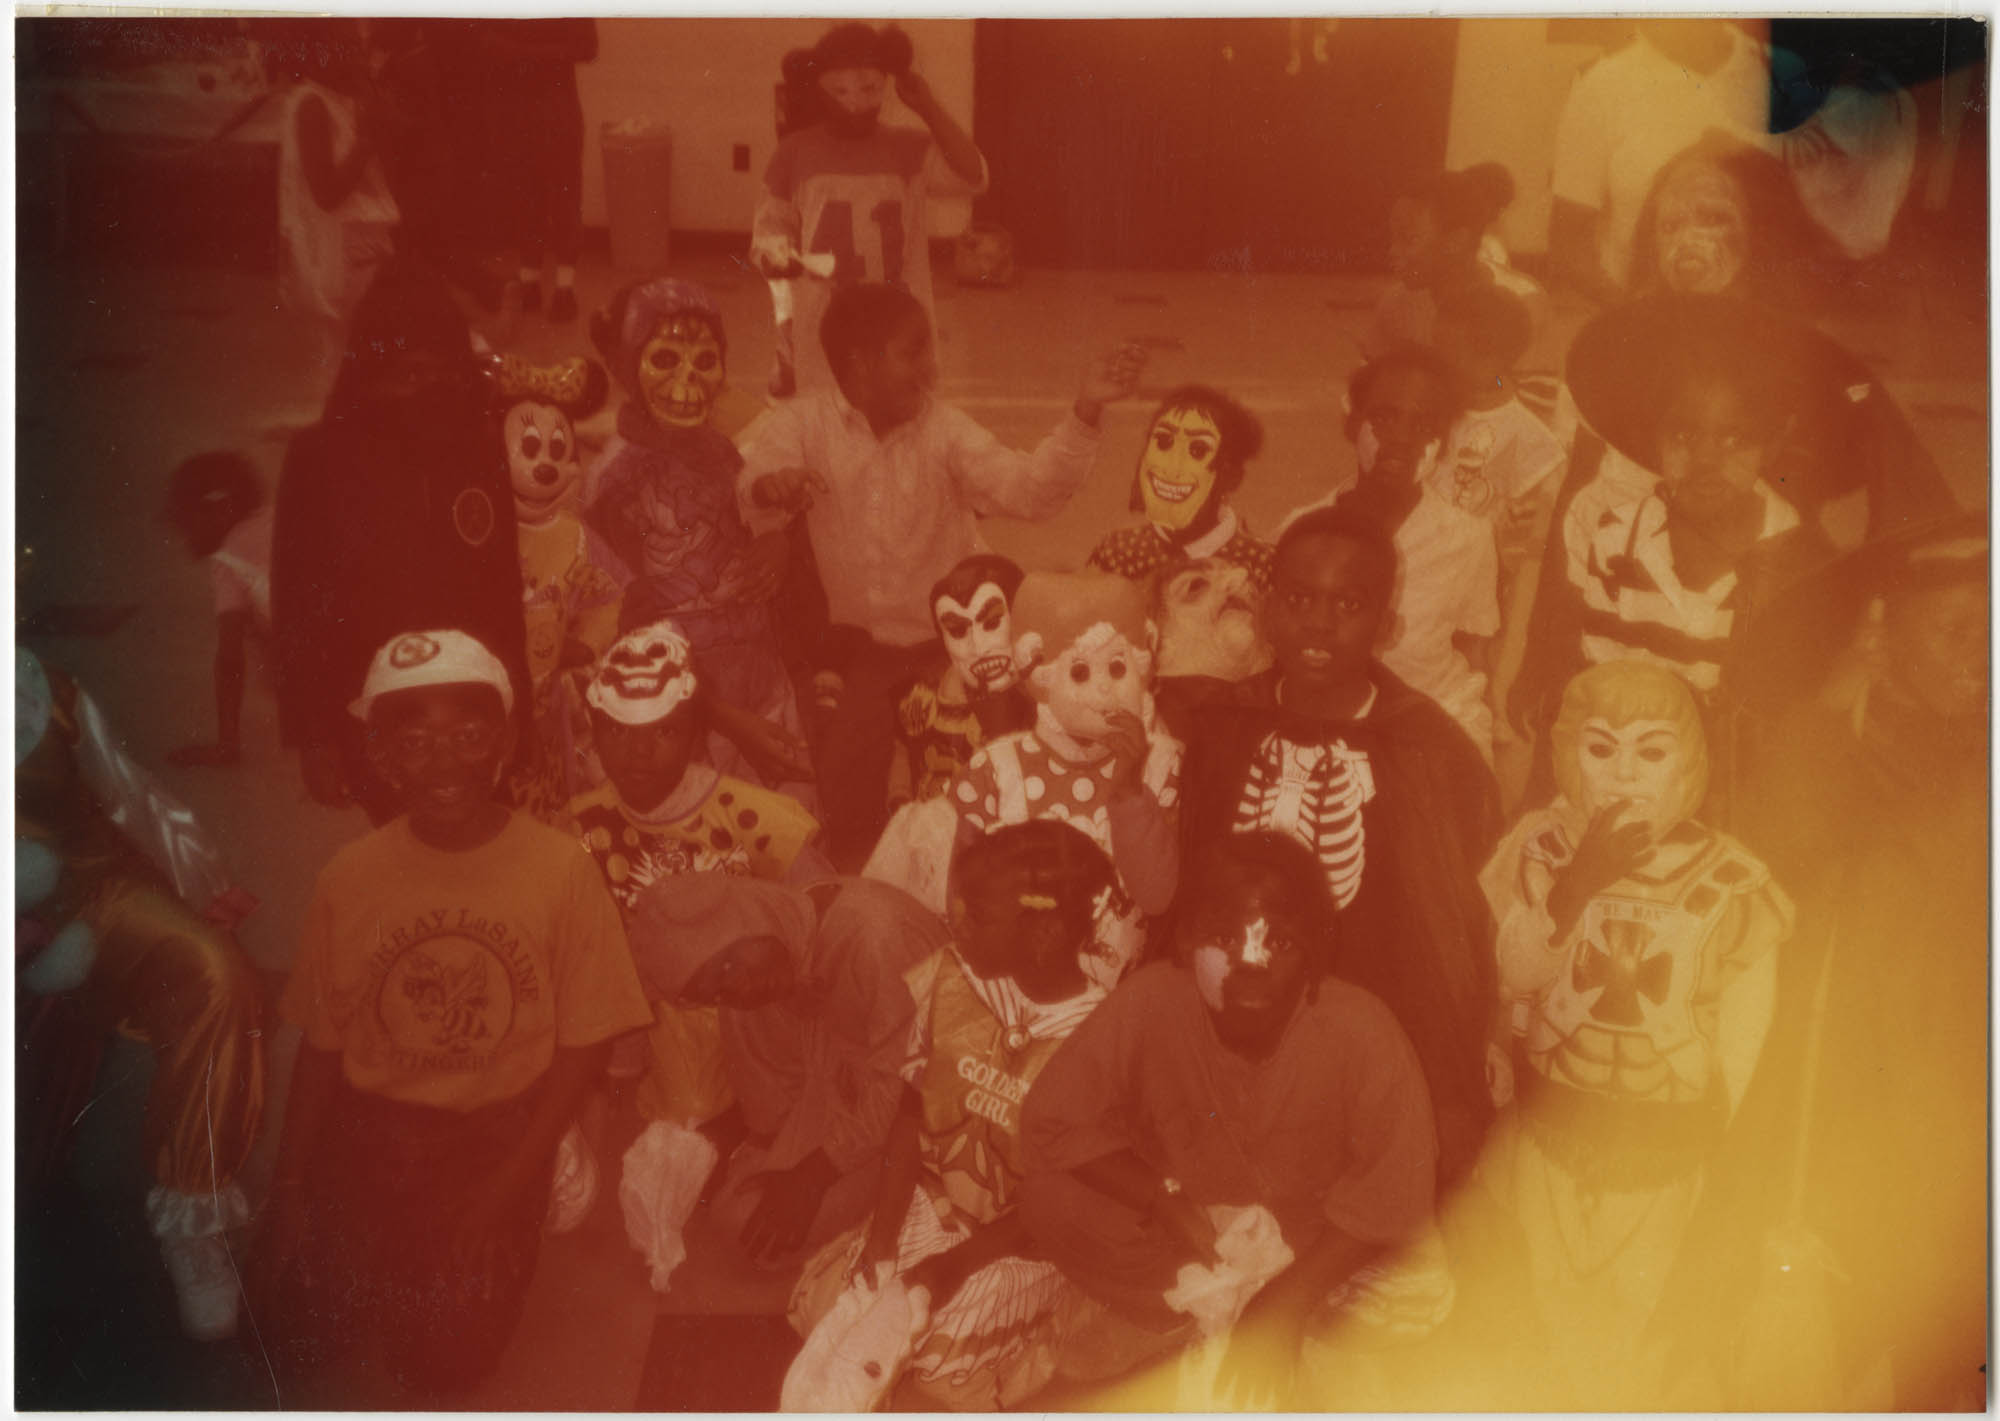 Photograph of Children in Halloween Costumes